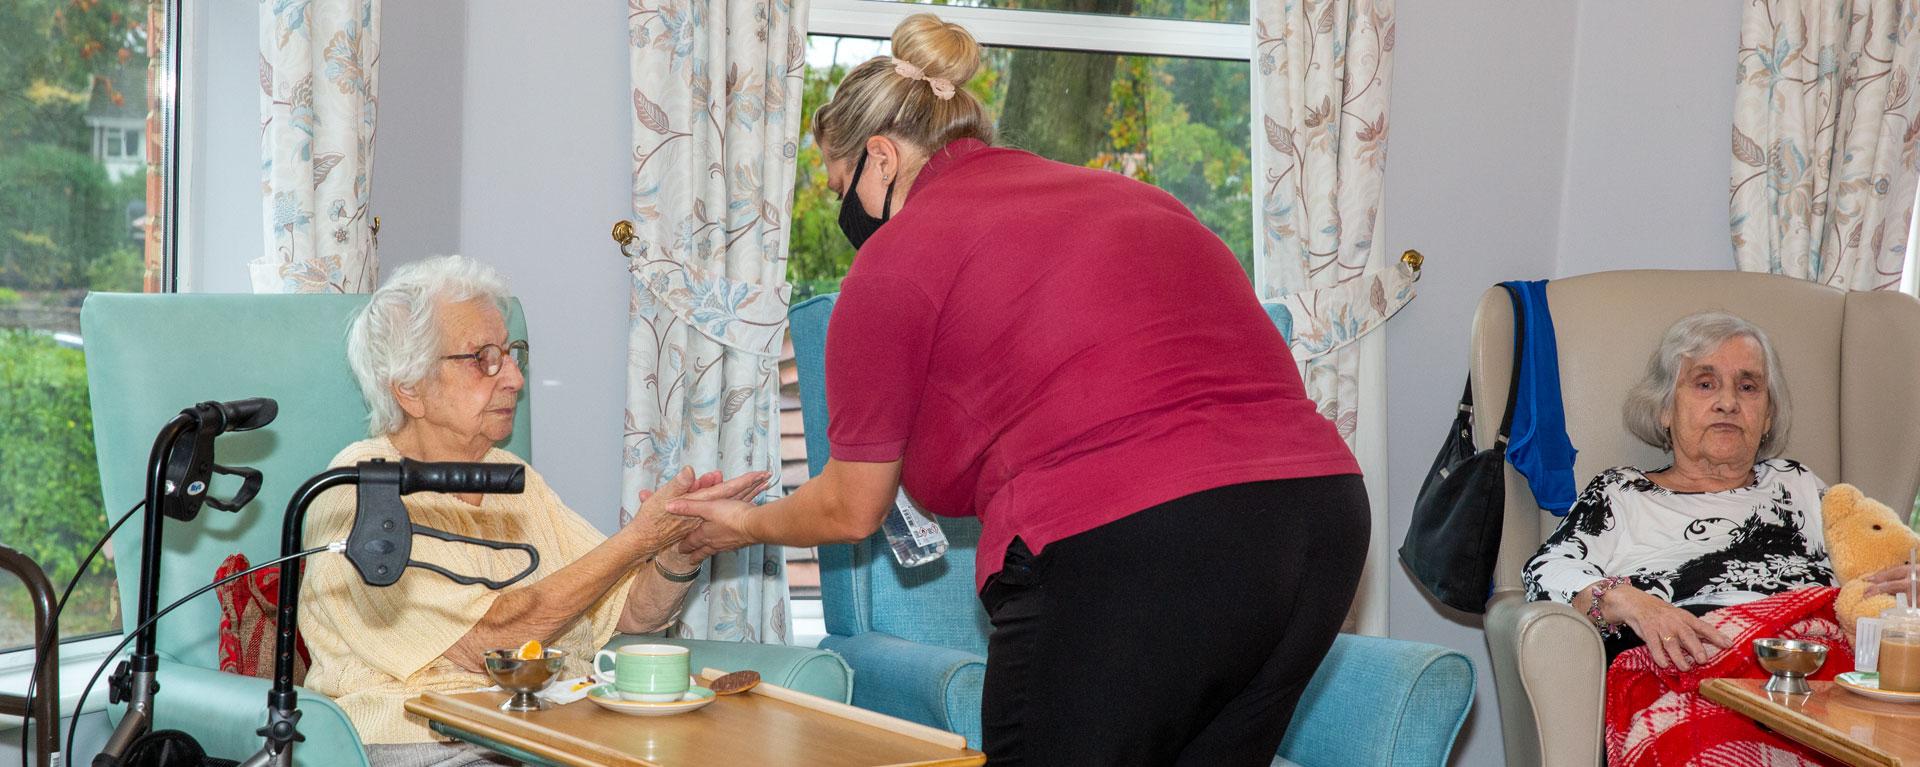 Activity coordinator giving resident hand sanitiser before playing skittles